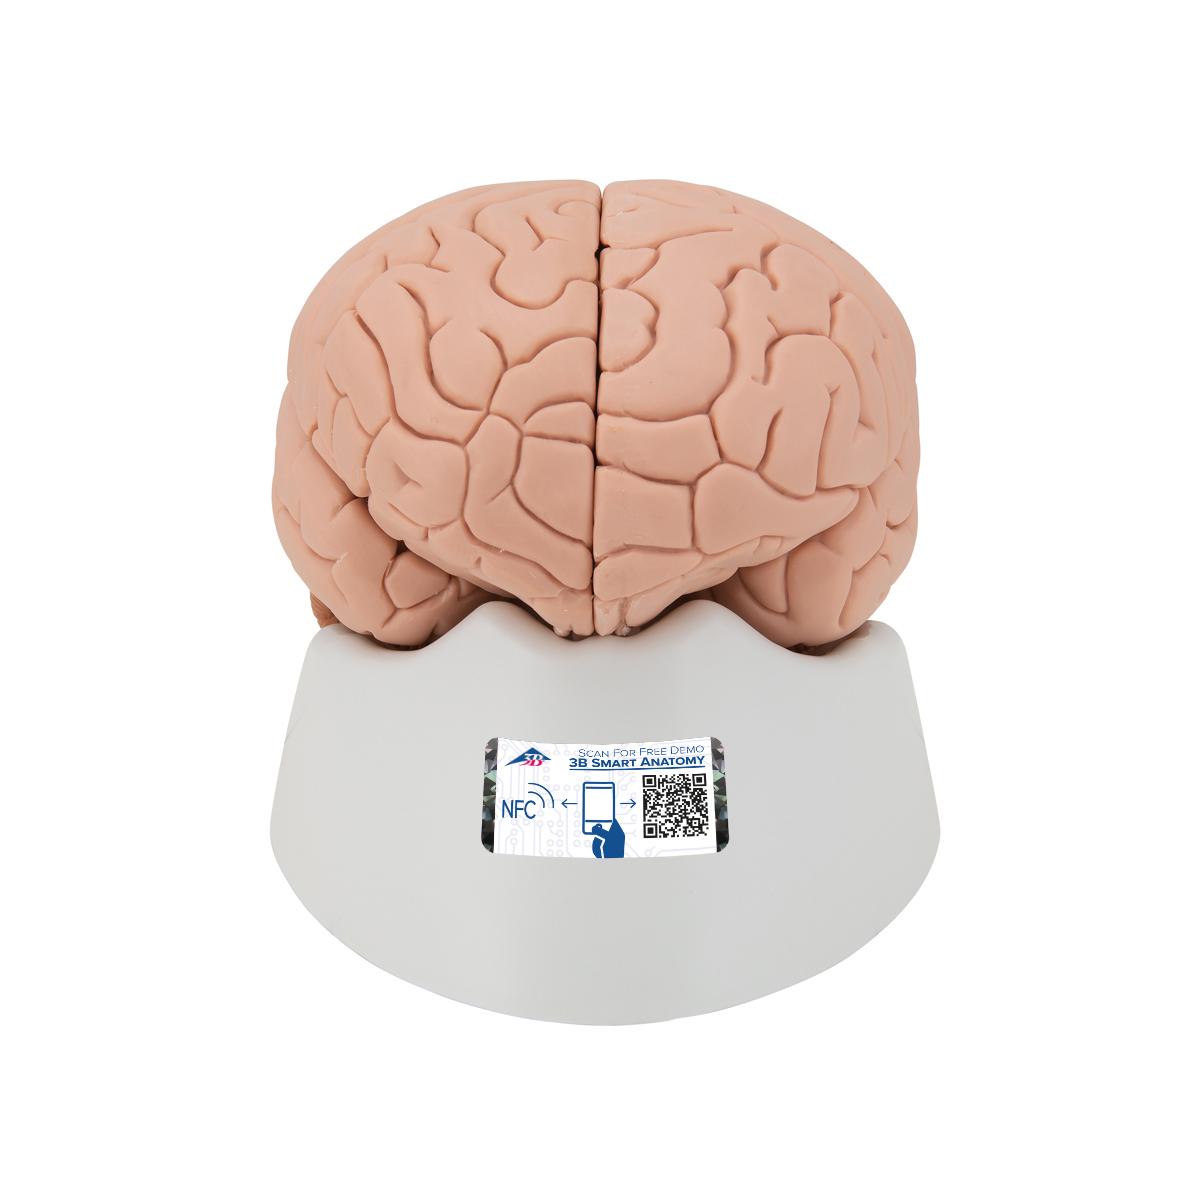 Anatomical Teaching Models - Plastic Human Brain Models - 4-Part ...